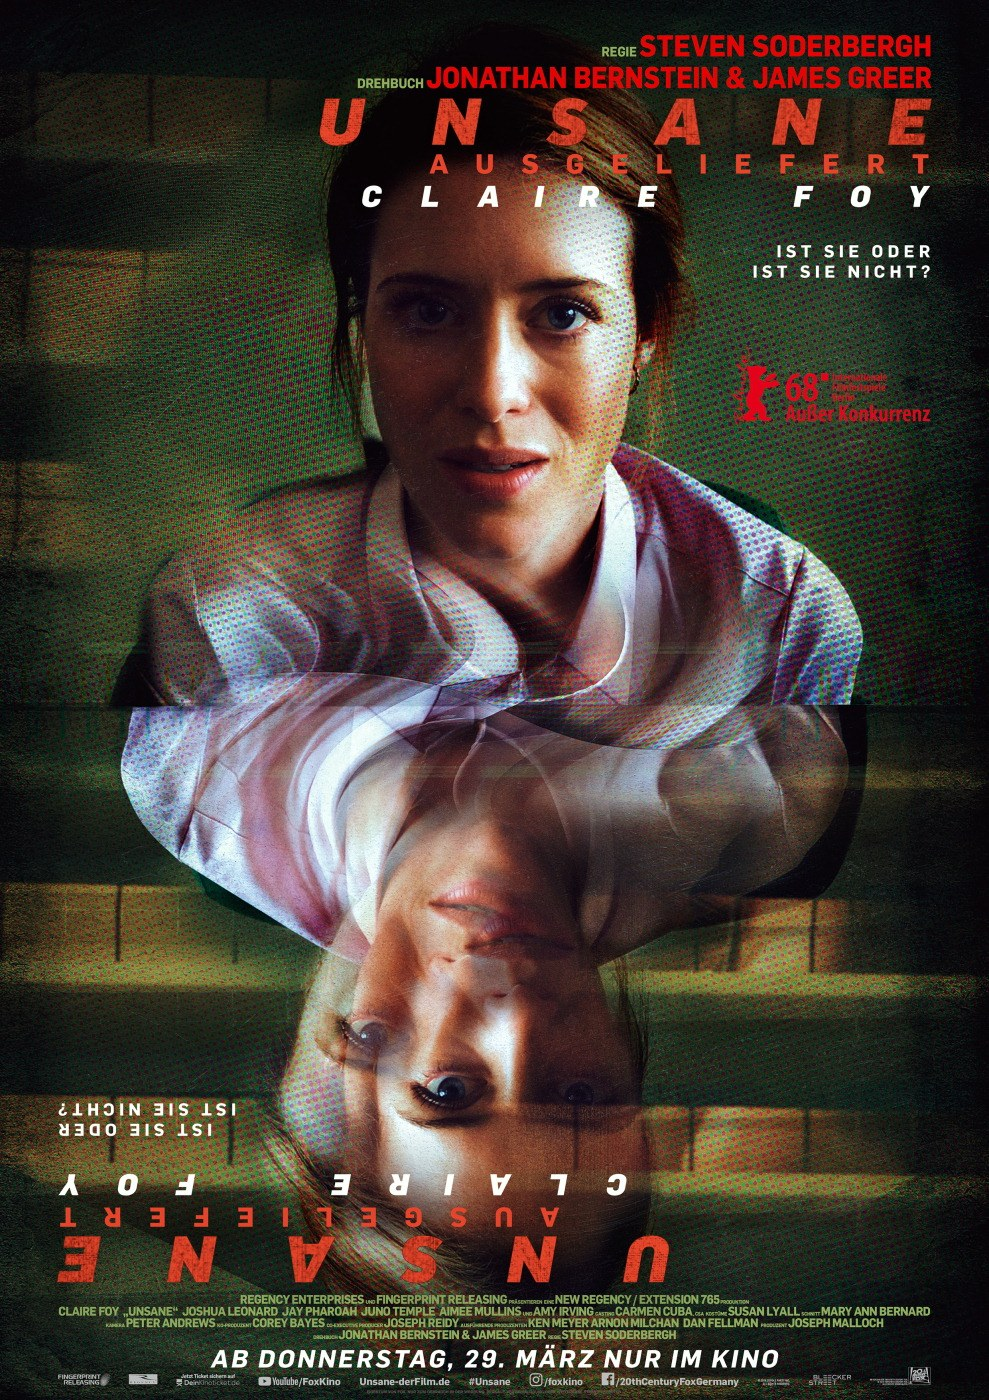 Cinestar Garbsen Filme